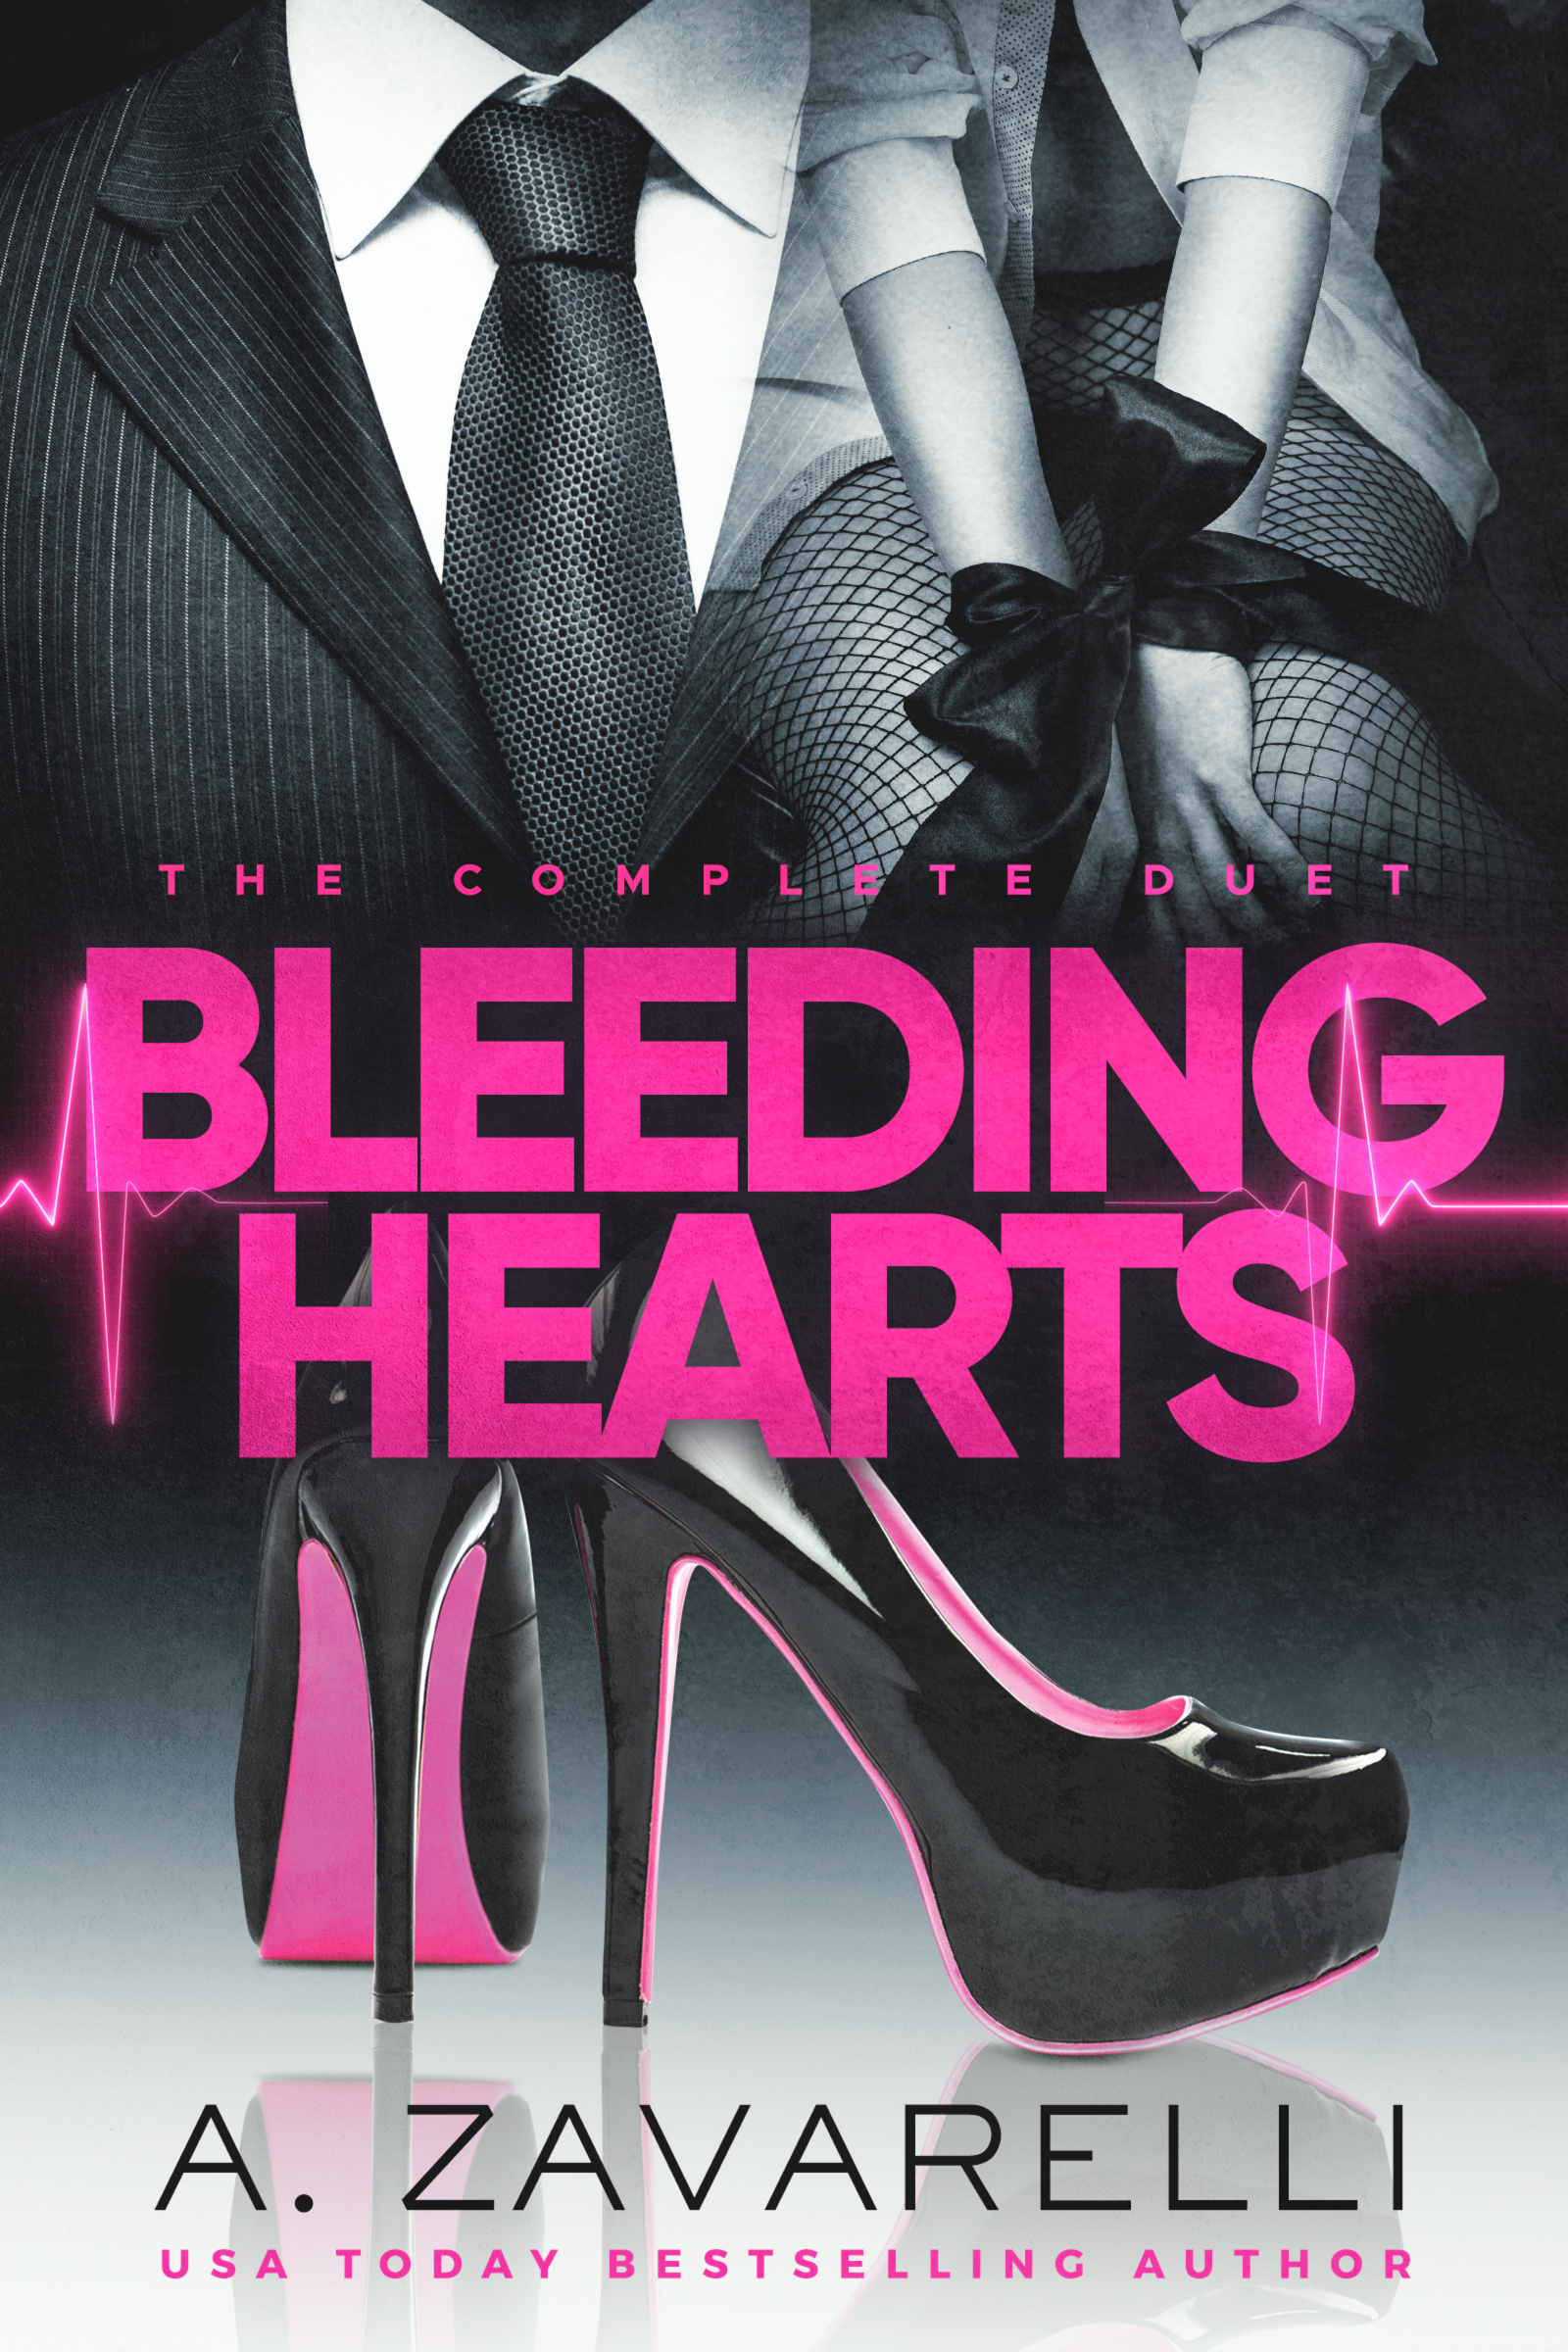 bleedingheartsduet